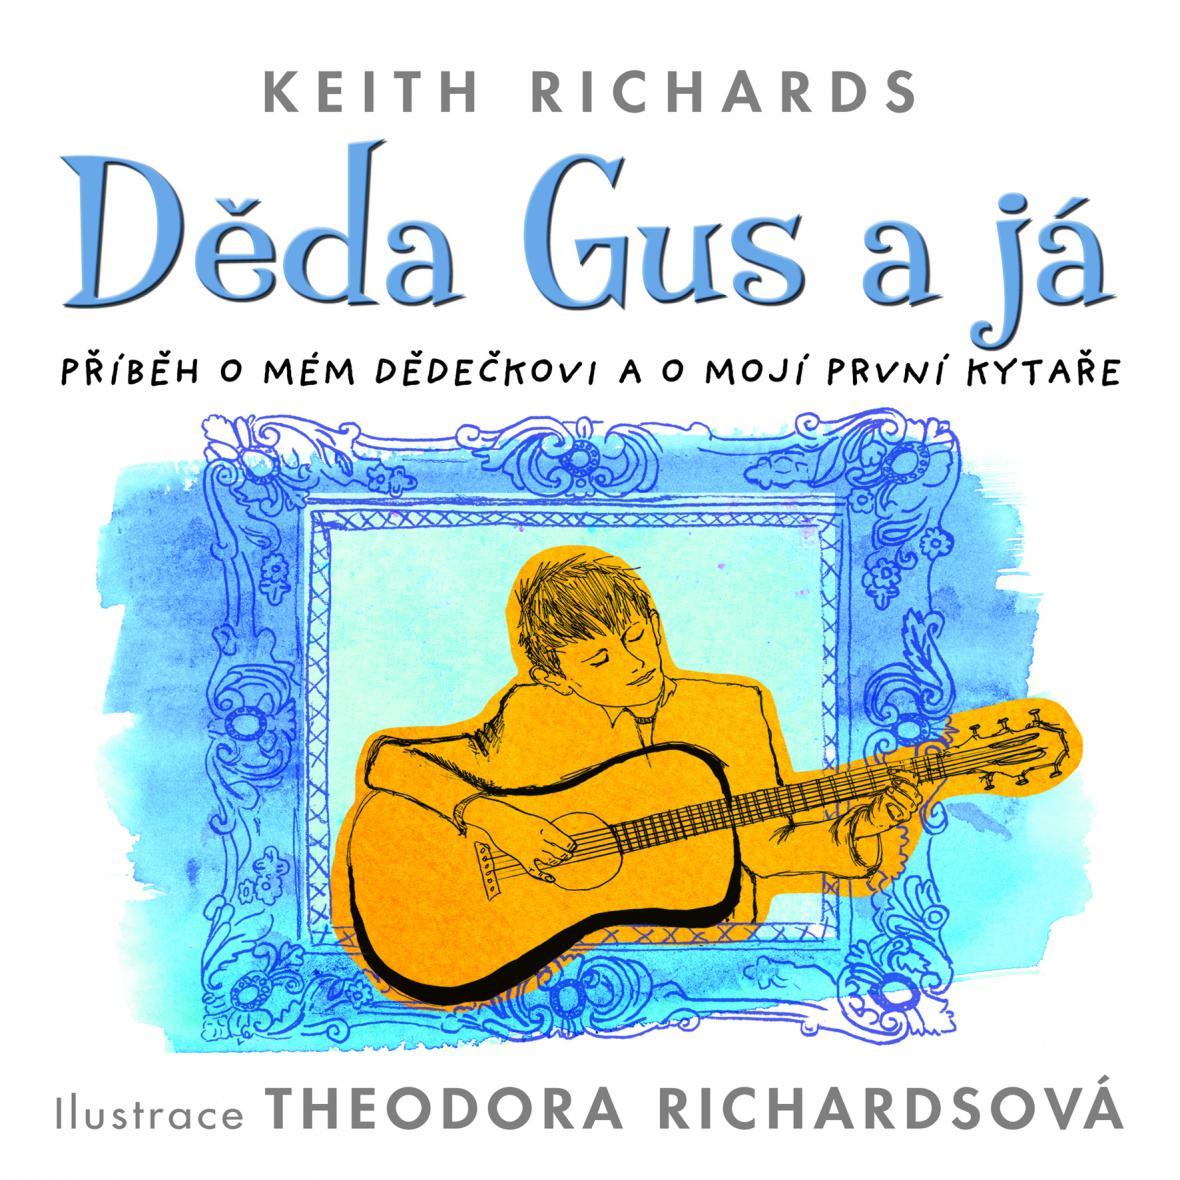 Keith Richards / Děda Gus a já